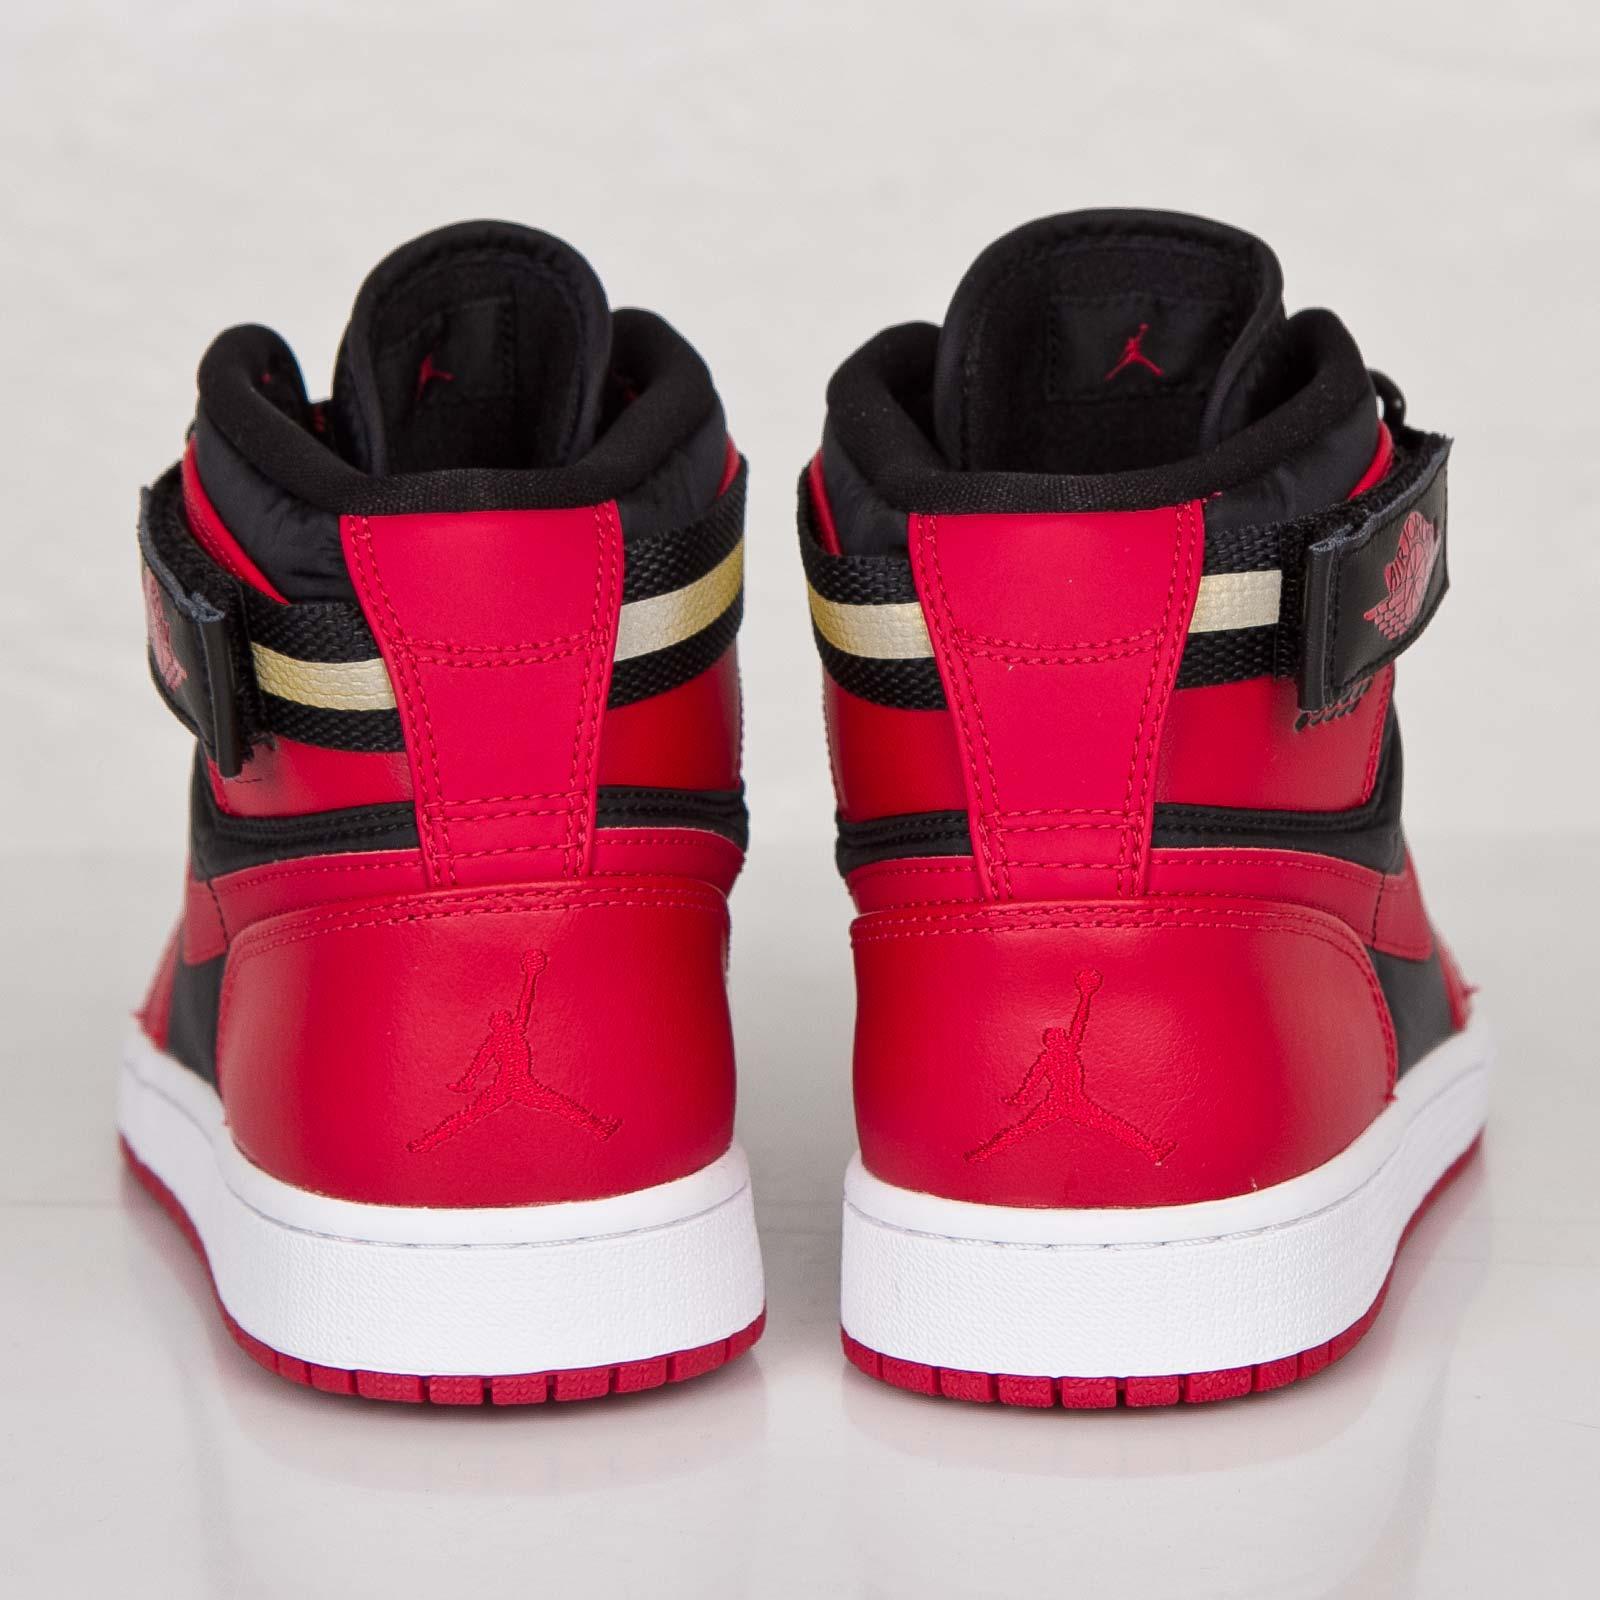 e6388c54a41 switzerland air jordan 1 high strap black gym red white 65aee 5a8f8